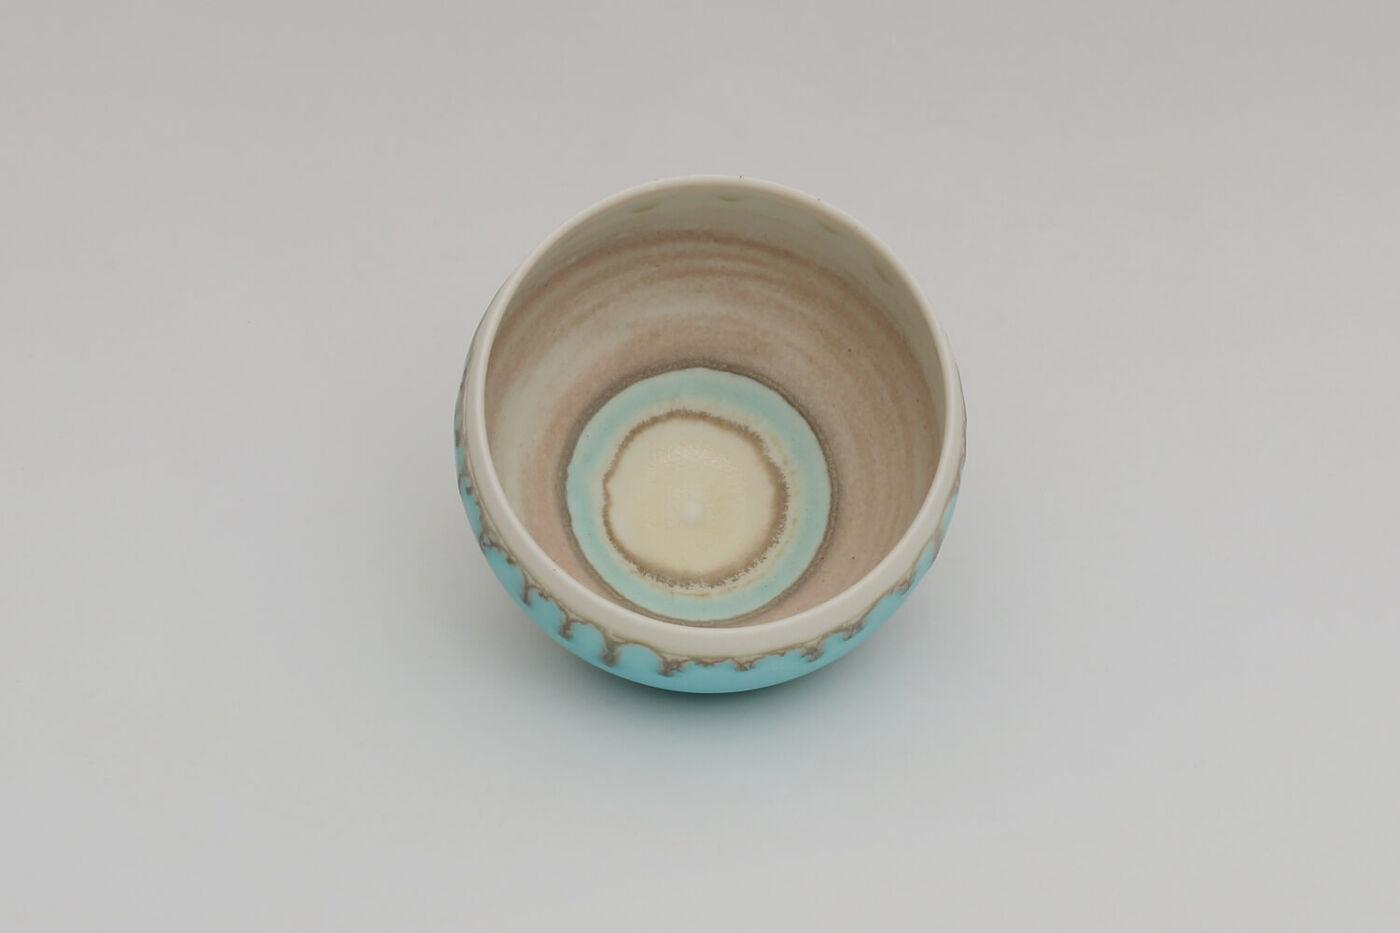 Peter Wills Ceramic Blue Porcelain Bowl 209